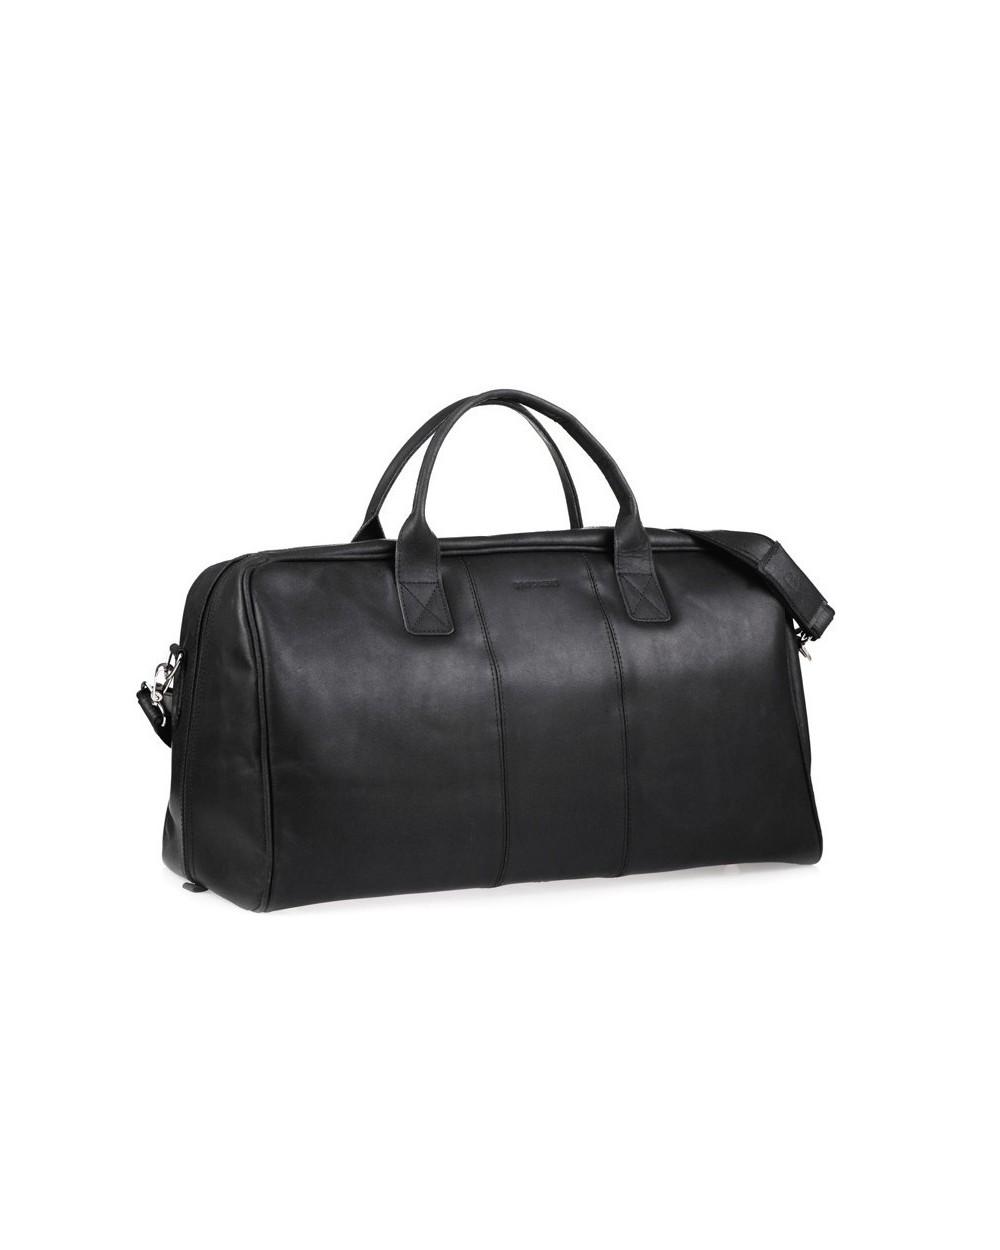 Casual skórzana torba podróżna na ramię czarna